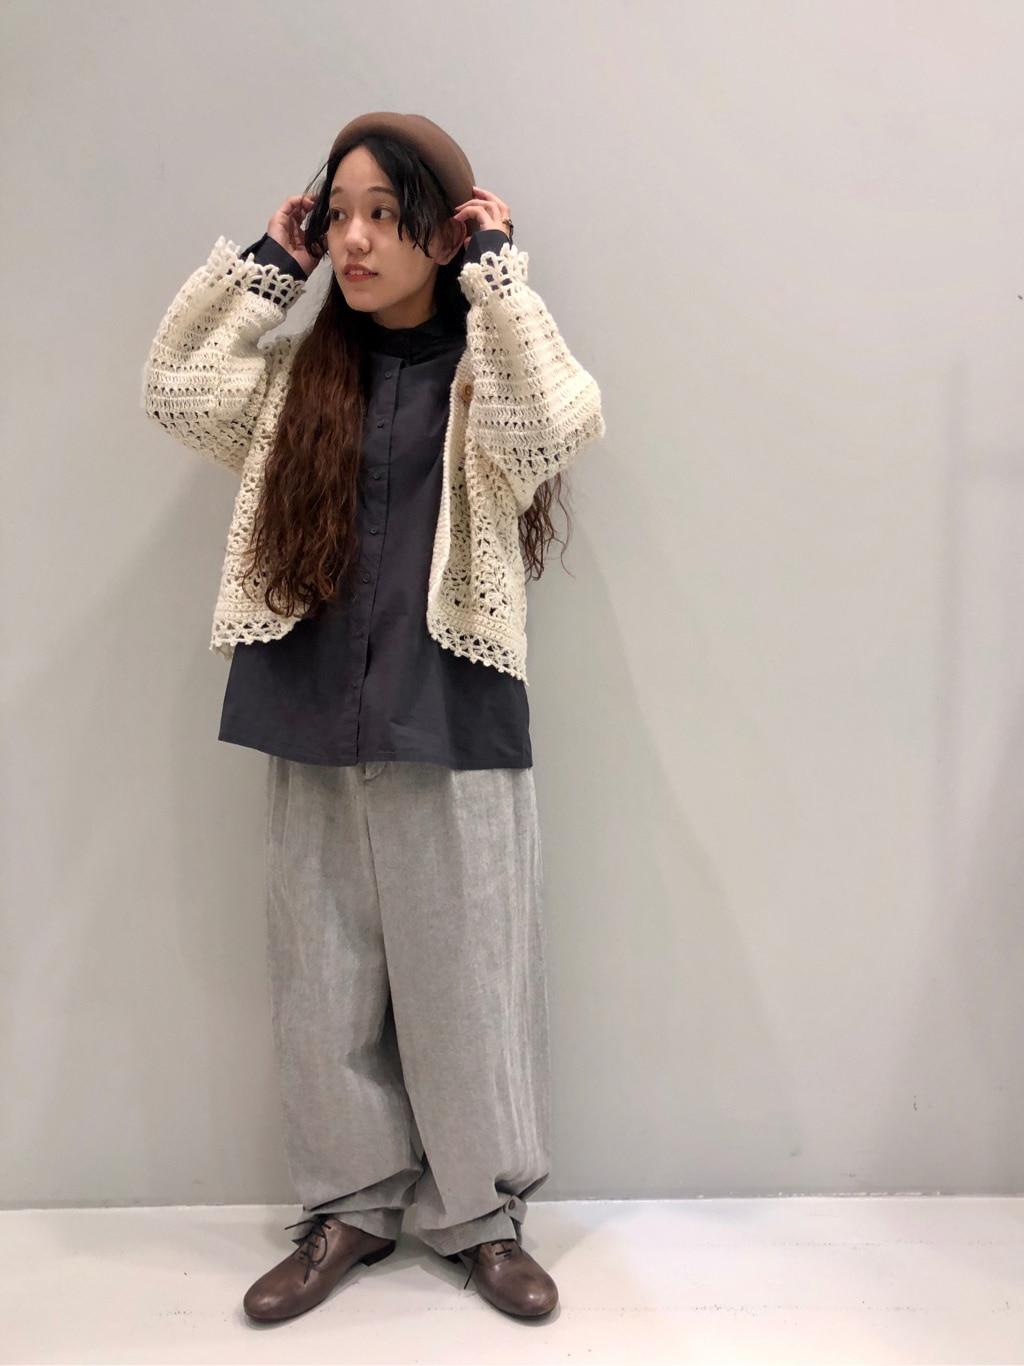 bulle de savon なんばシティ 身長:148cm 2020.10.02